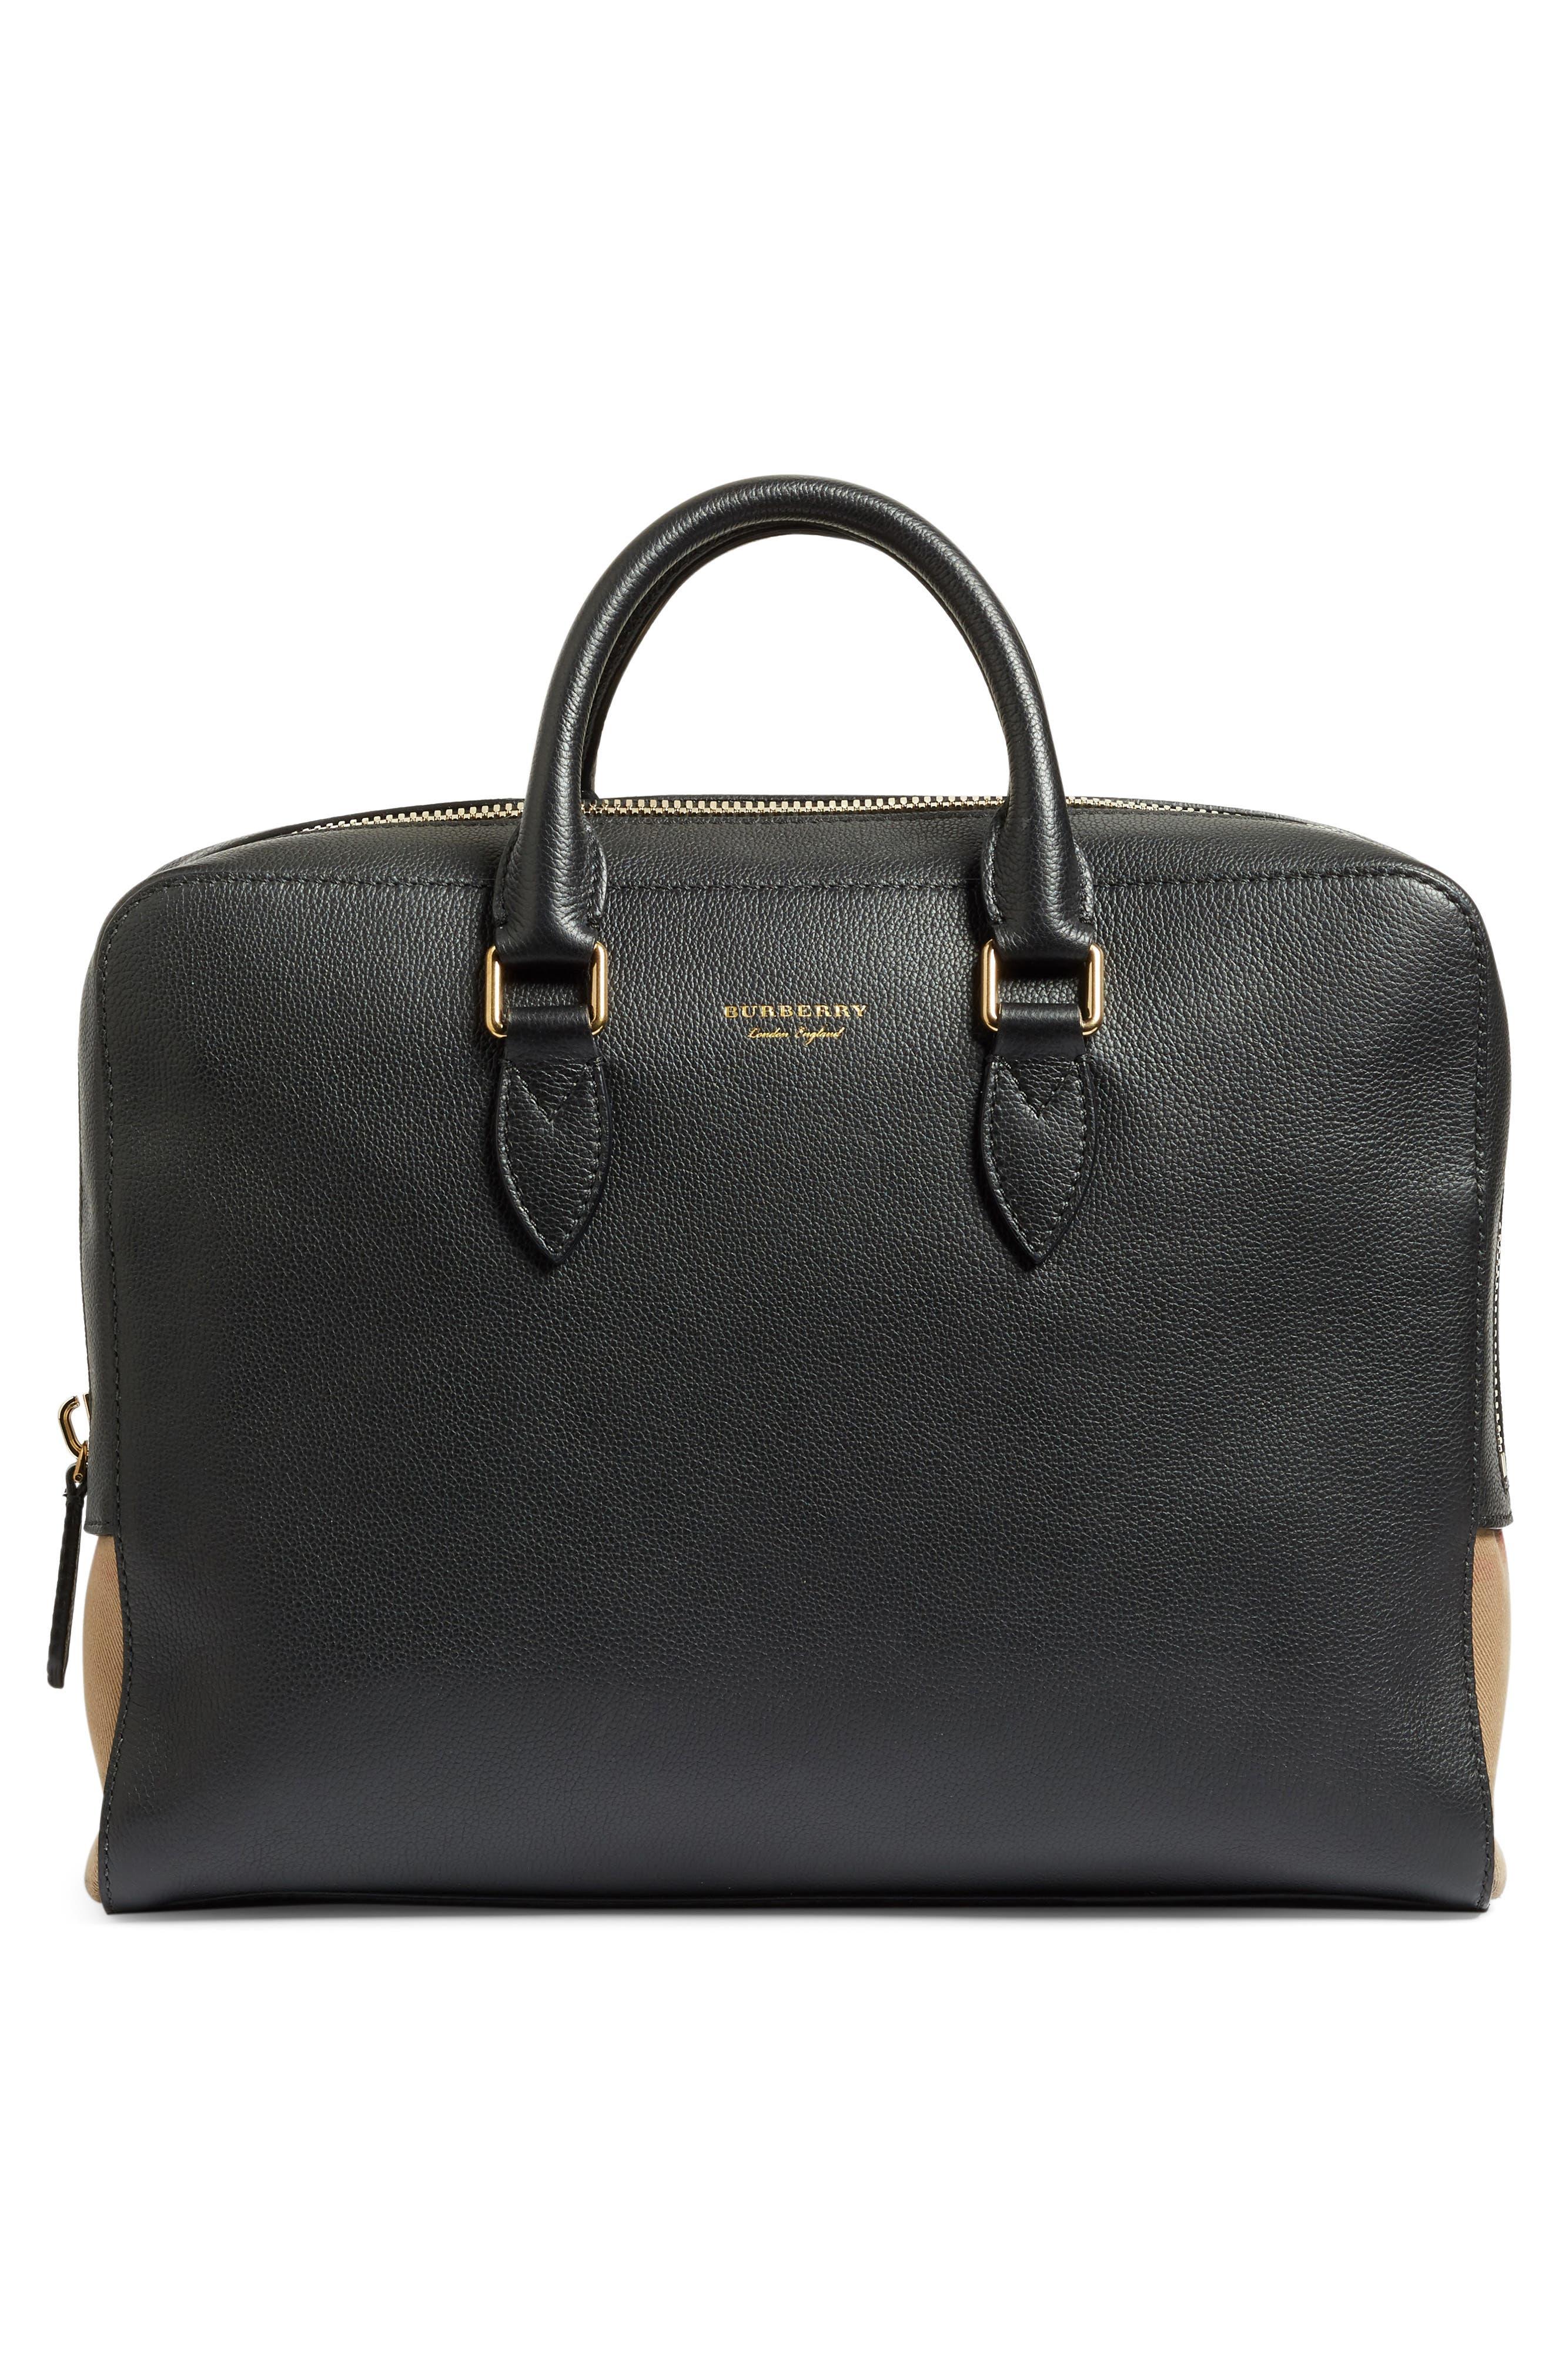 Horton Leather Briefcase,                             Alternate thumbnail 2, color,                             001